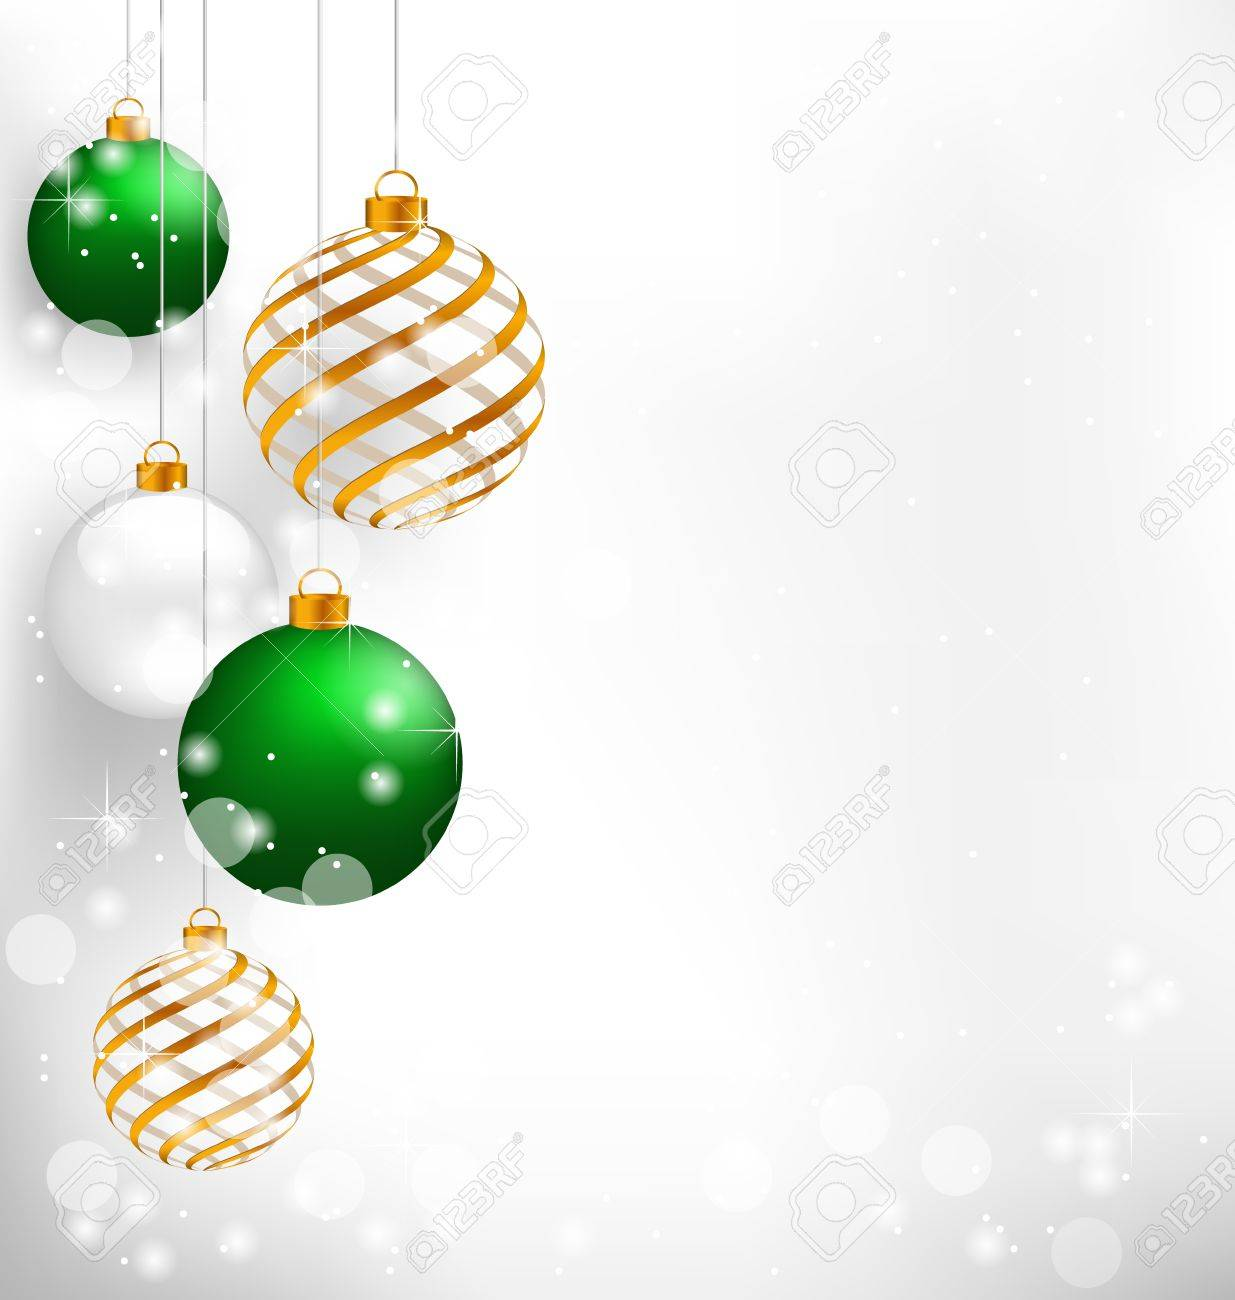 Green spiral christmas balls hang on white background - 34247094